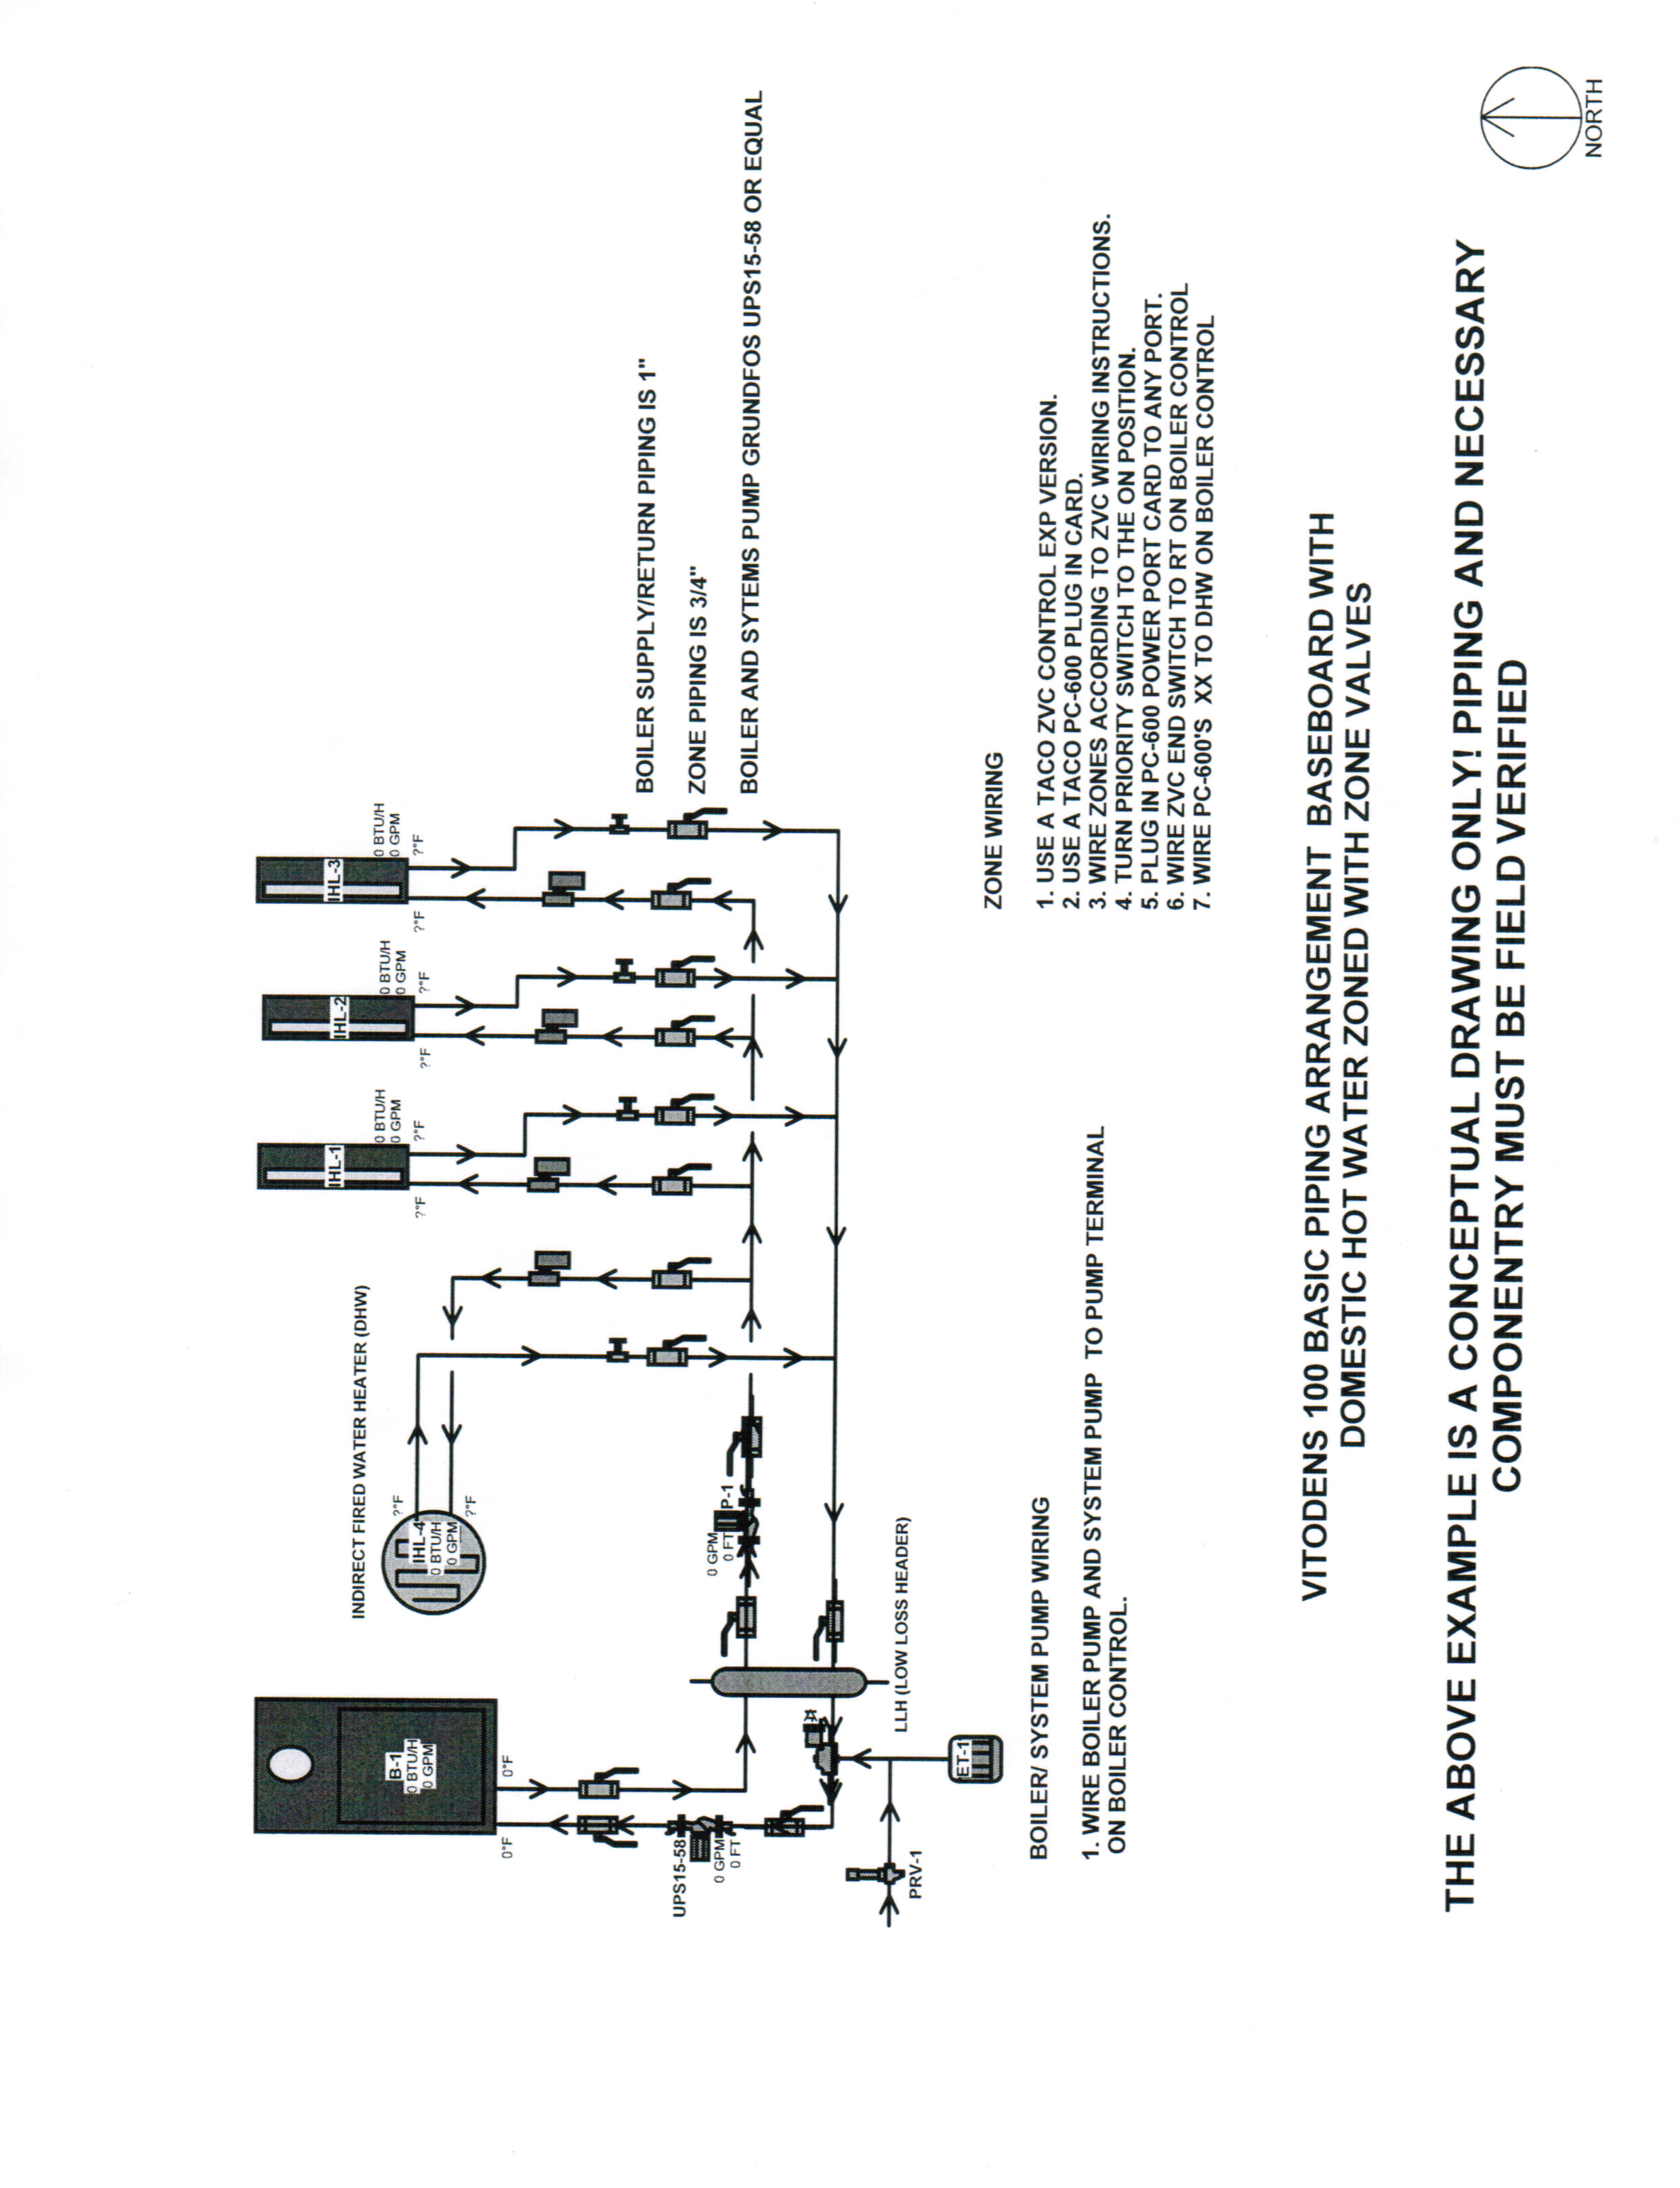 viessmann boiler wiring diagrams 1999 ford mustang fuel pump diagram  heating help the wall